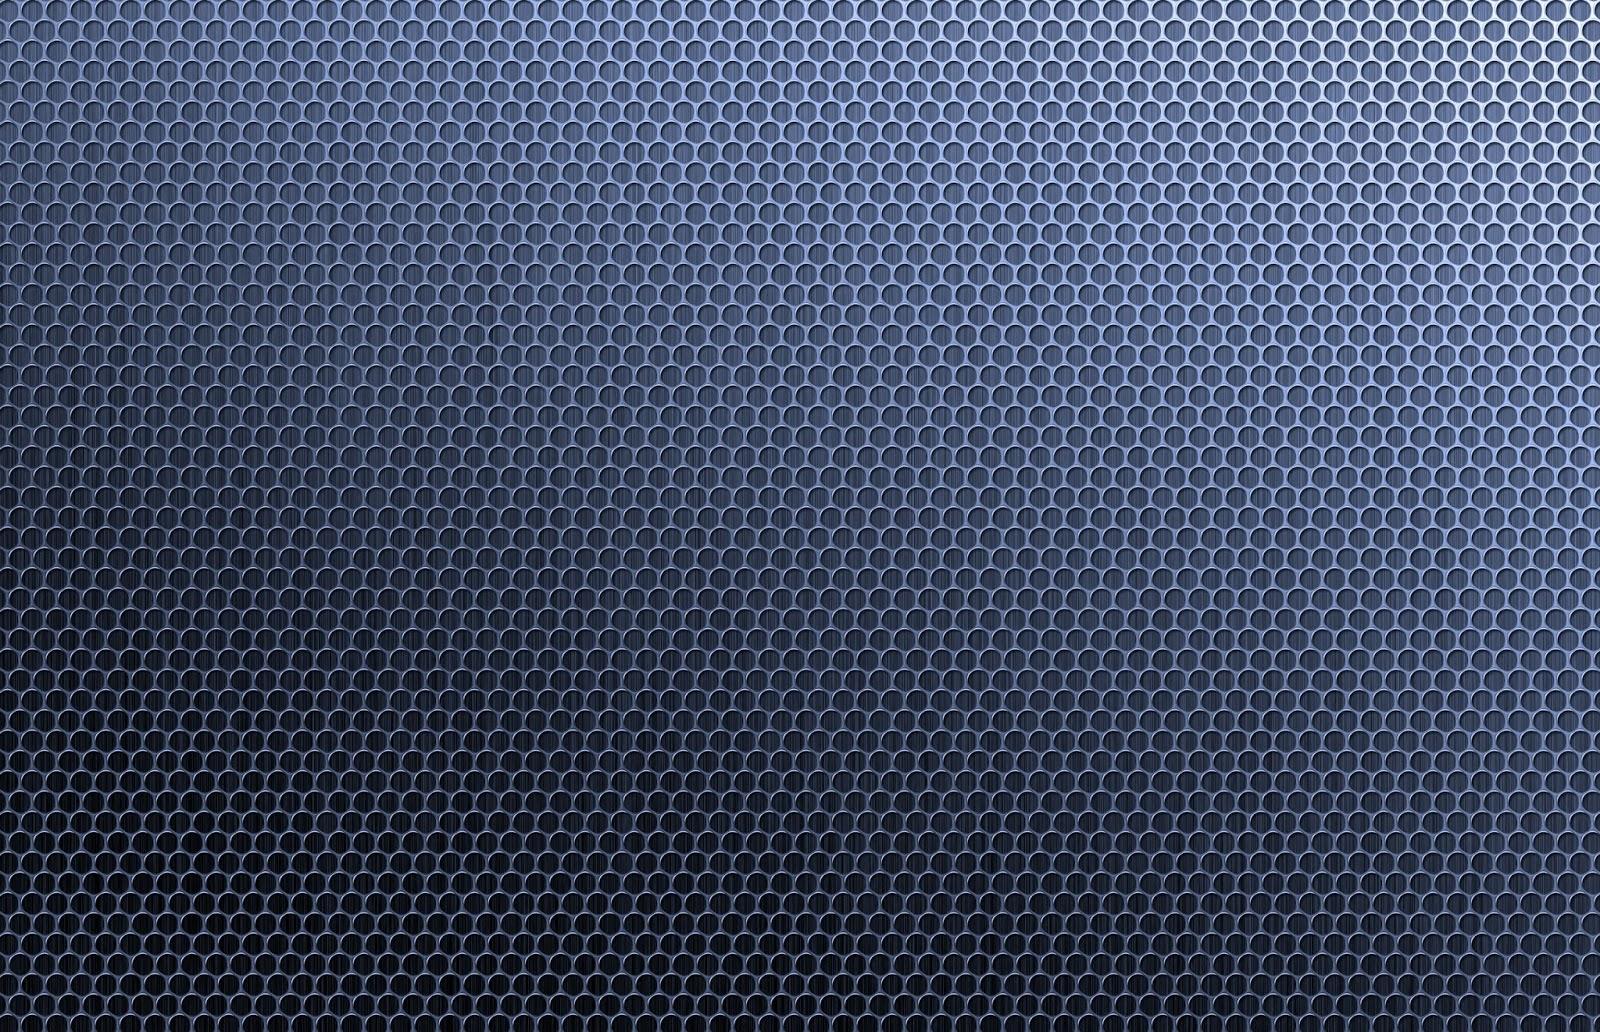 HD Wallpapers Desktop Simple Plain HD DeskTop Wallpapers 1600x1032